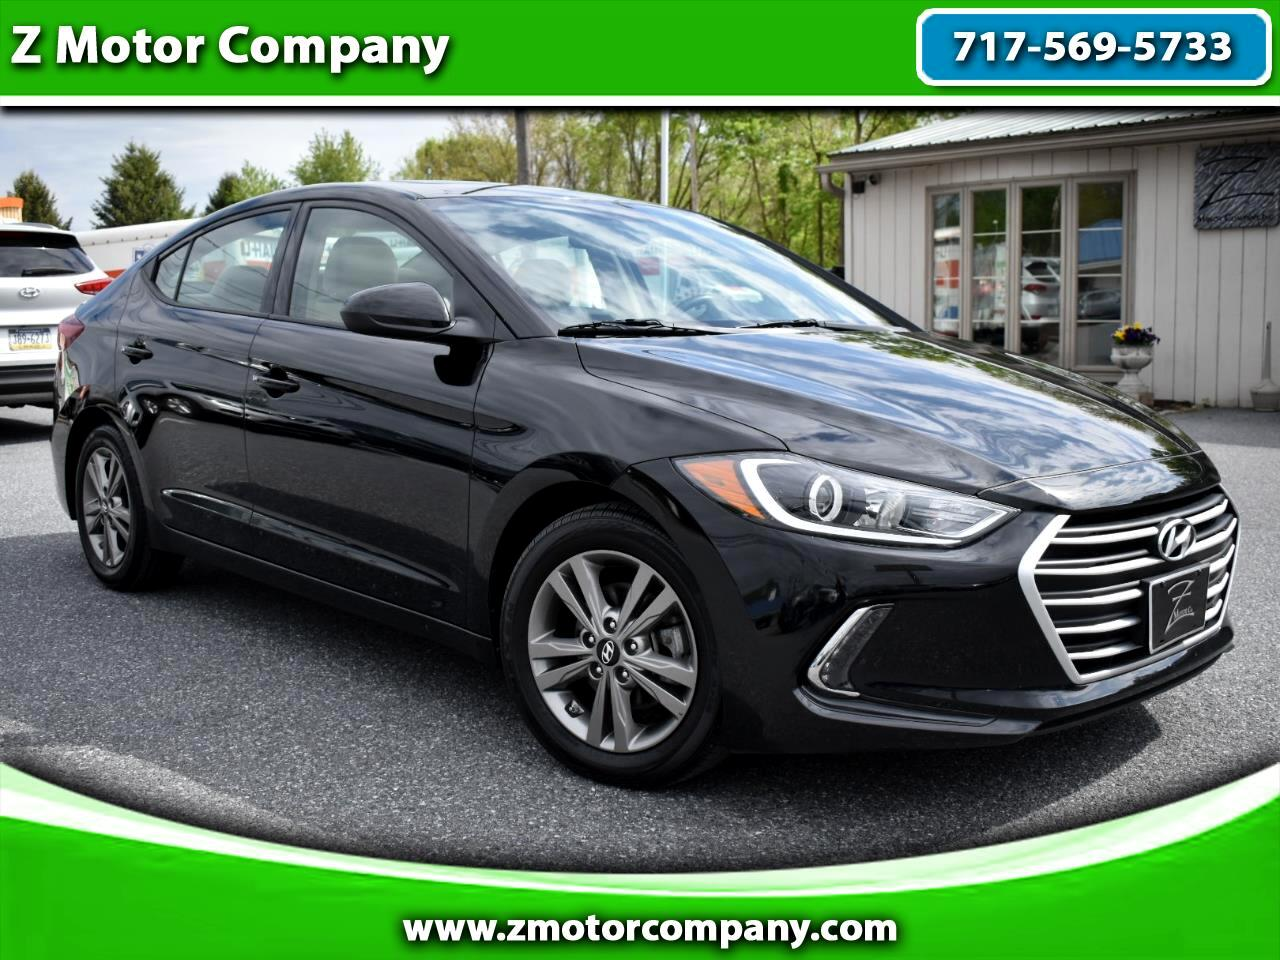 2017 Hyundai Elantra Value Edition (Alabama)